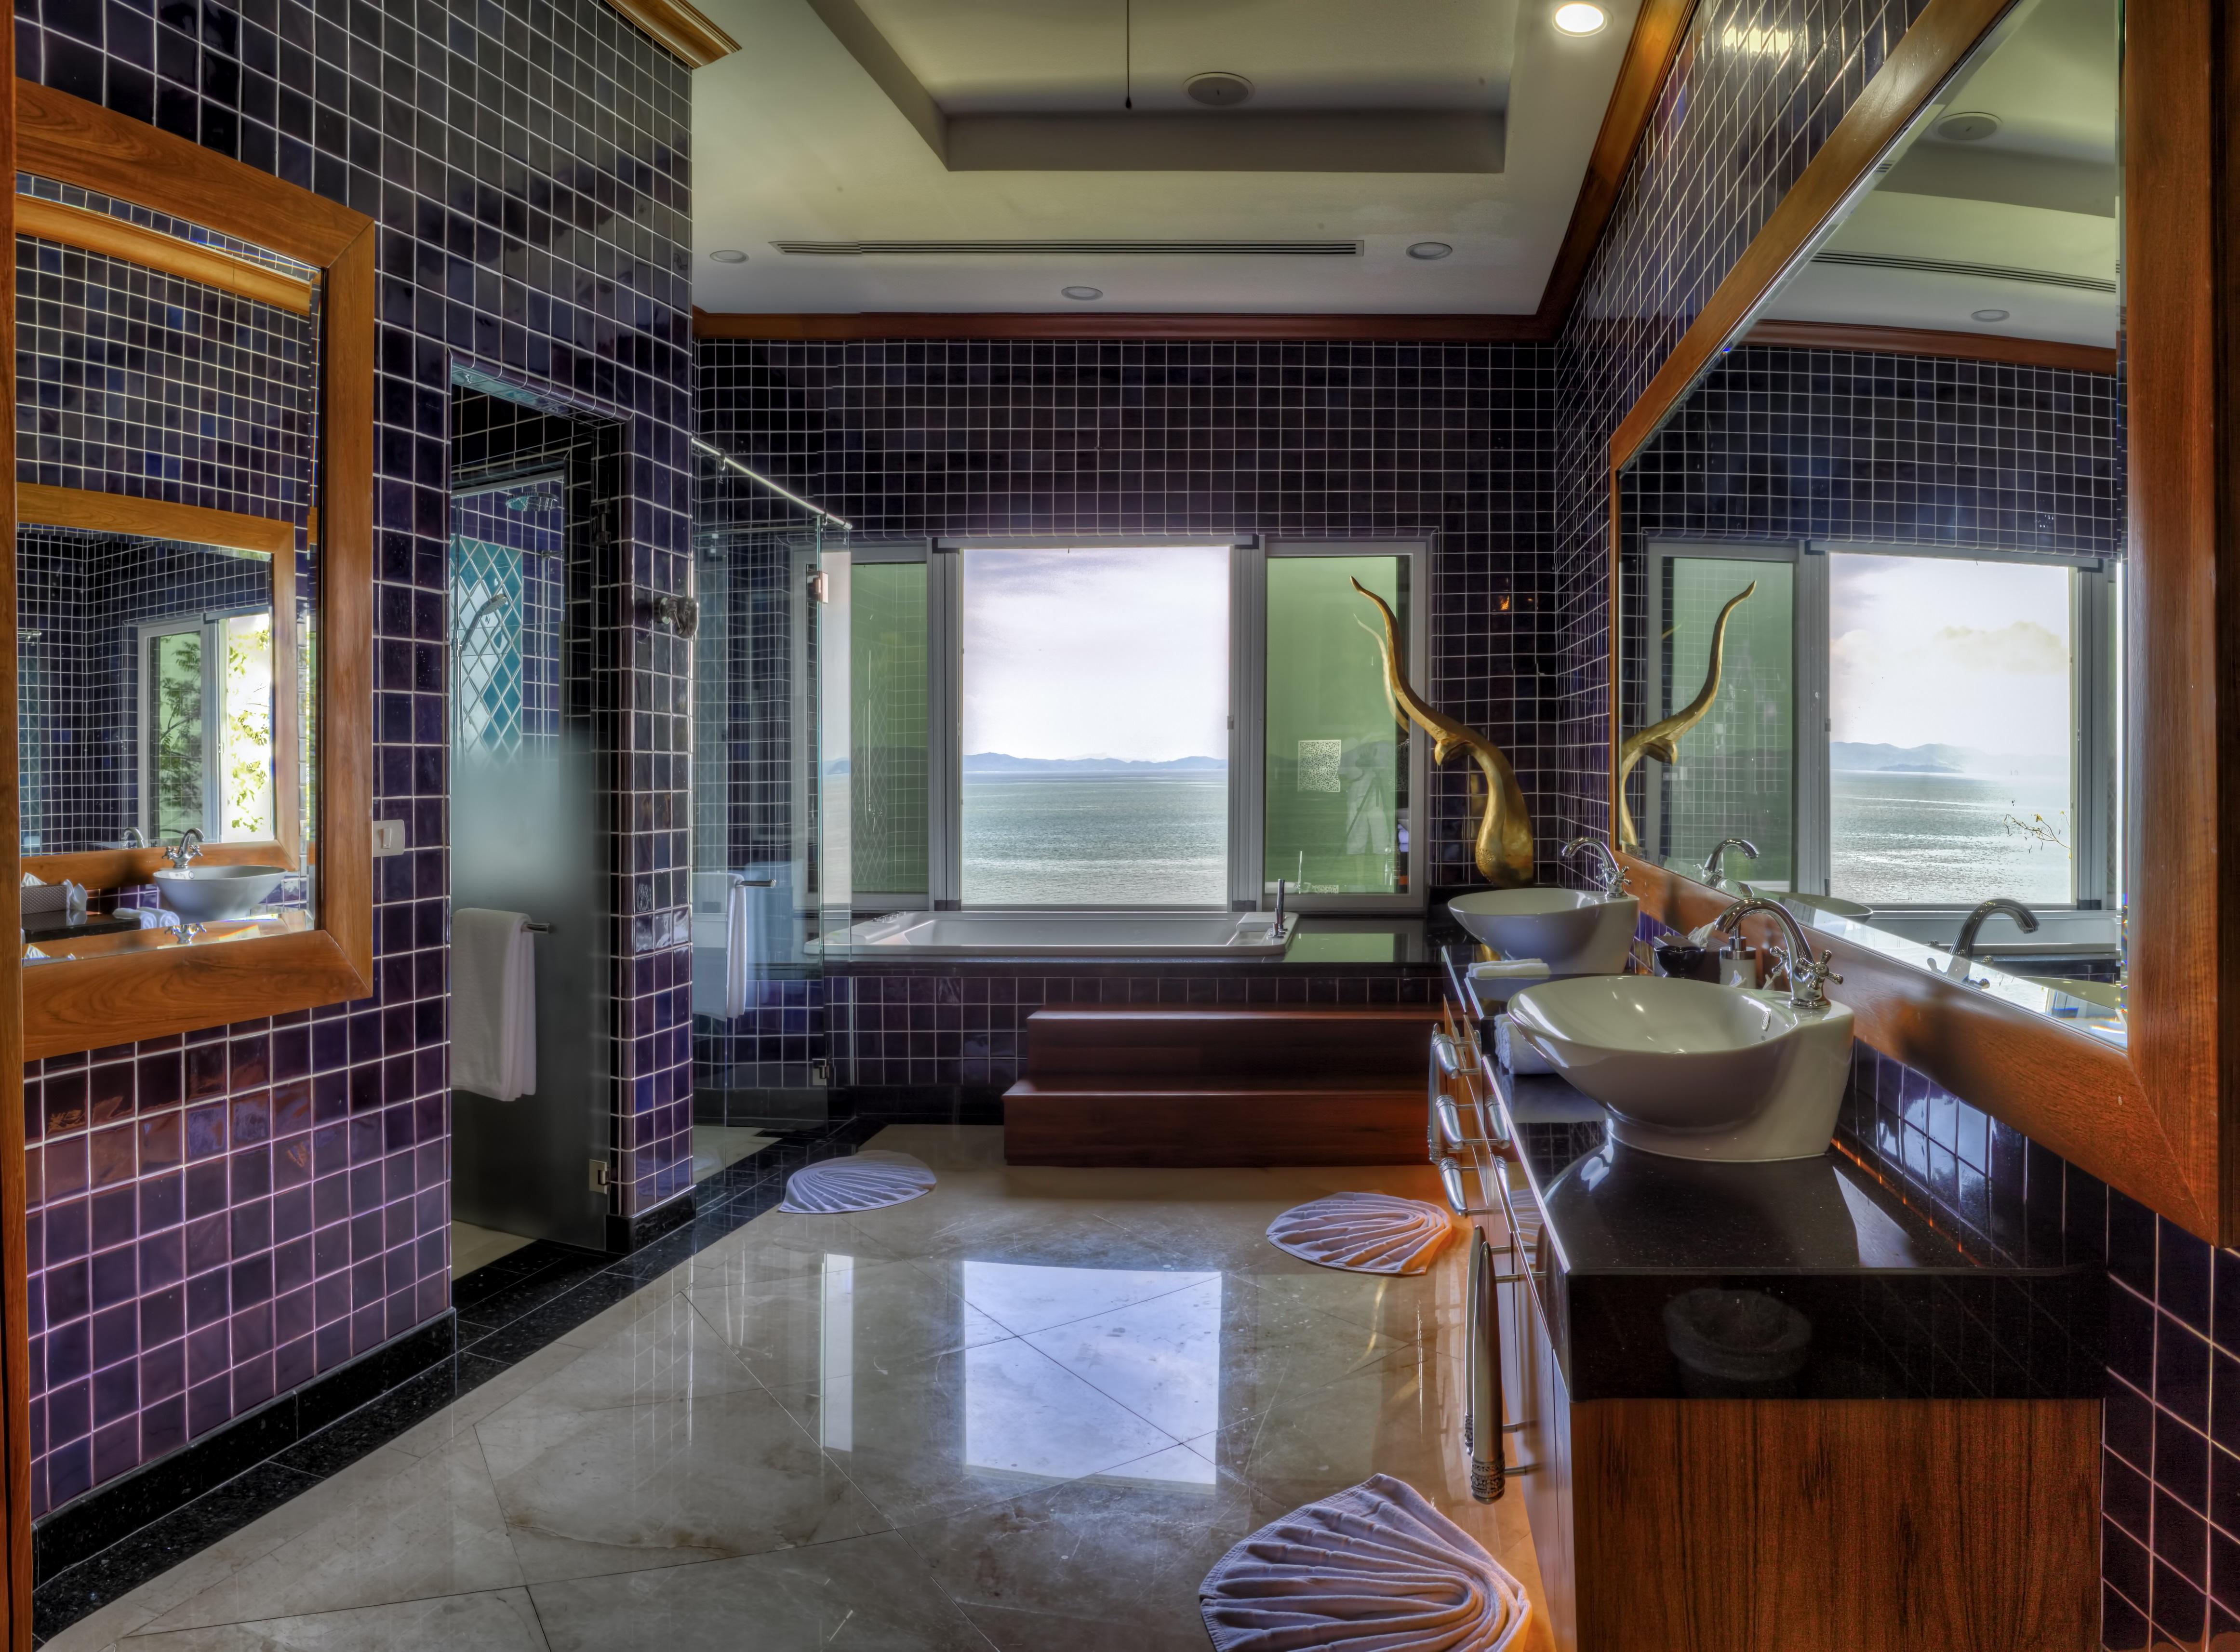 4.Seaside Villa Seaside Bedroom #1 Bath